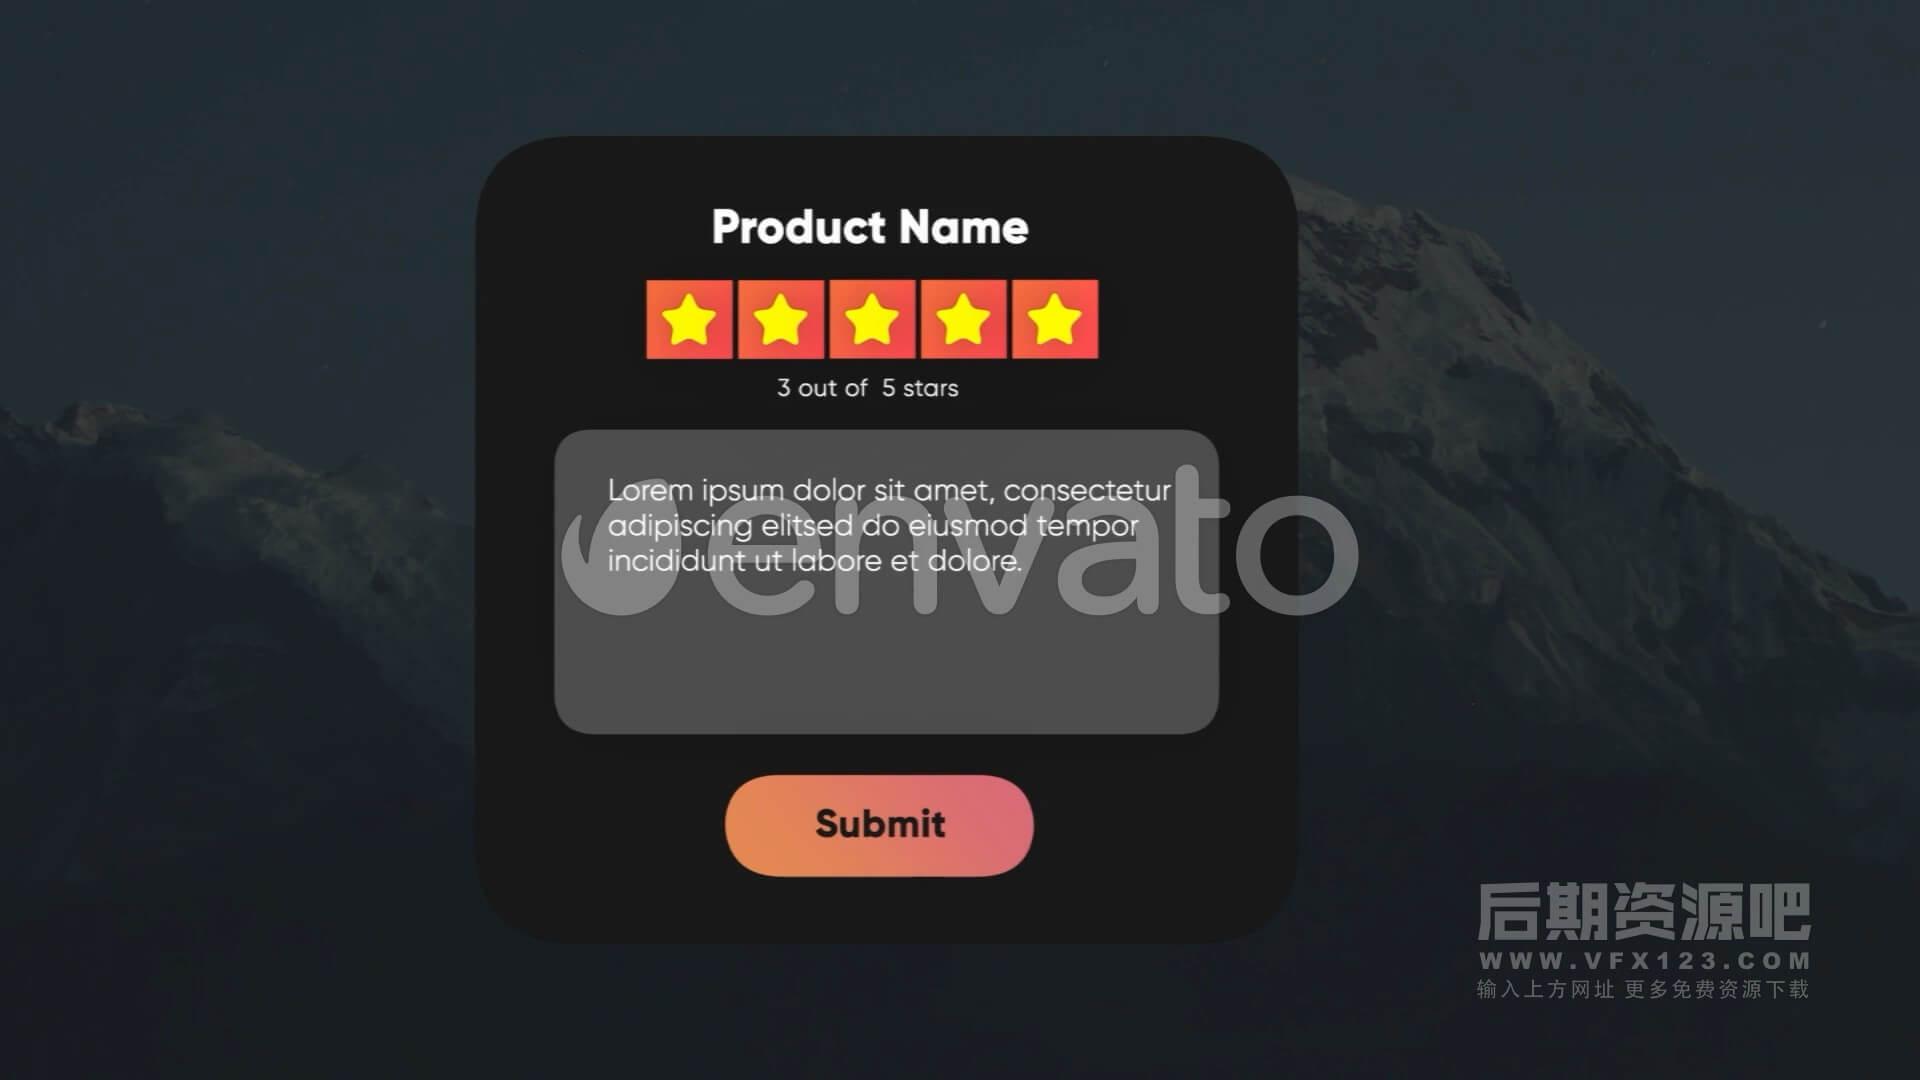 Fcpx插件 五星评价评分元素动画制作包 Rating Elements Toolkit